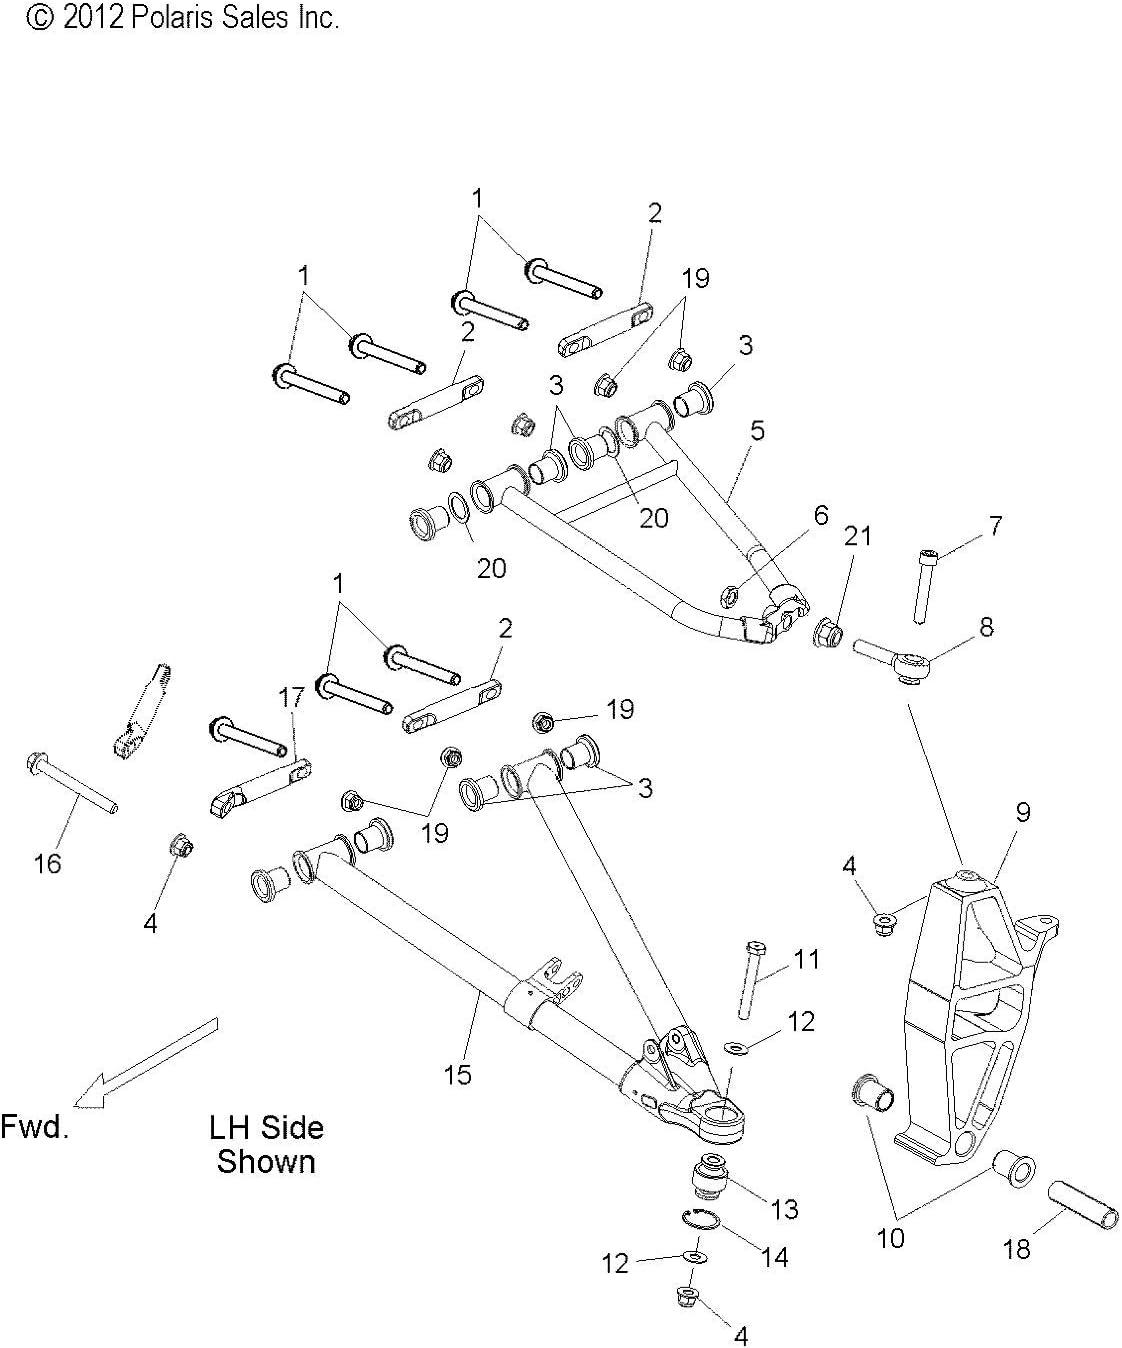 Polaris ASM-SPINDLE,LH MTRC,RMK BLK